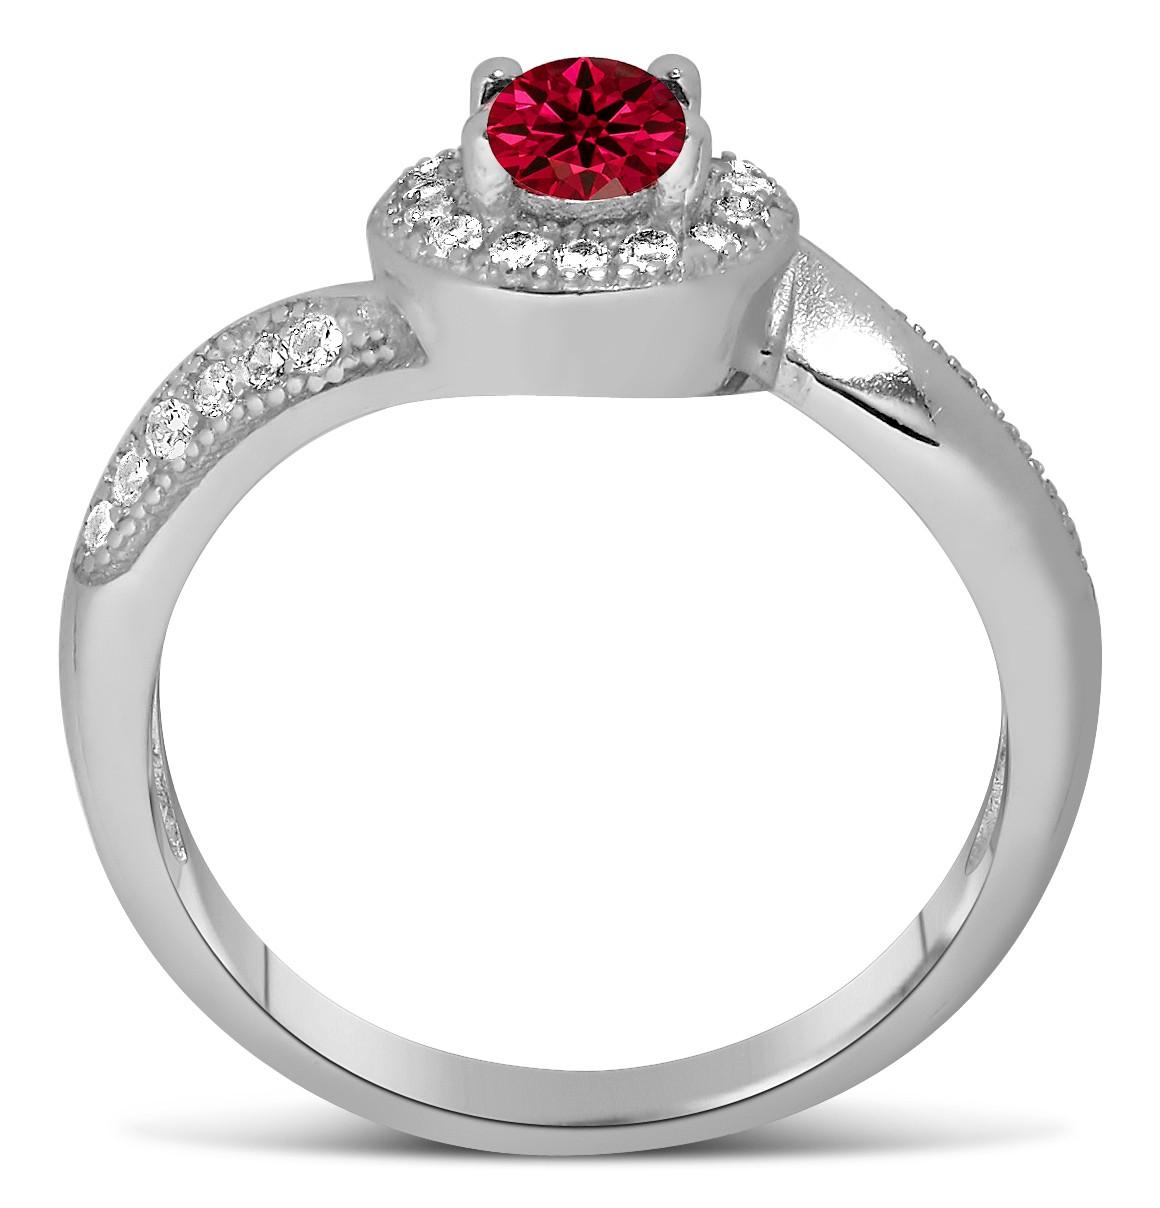 Antique Designer 1 Carat Red Ruby And Diamond Engagement